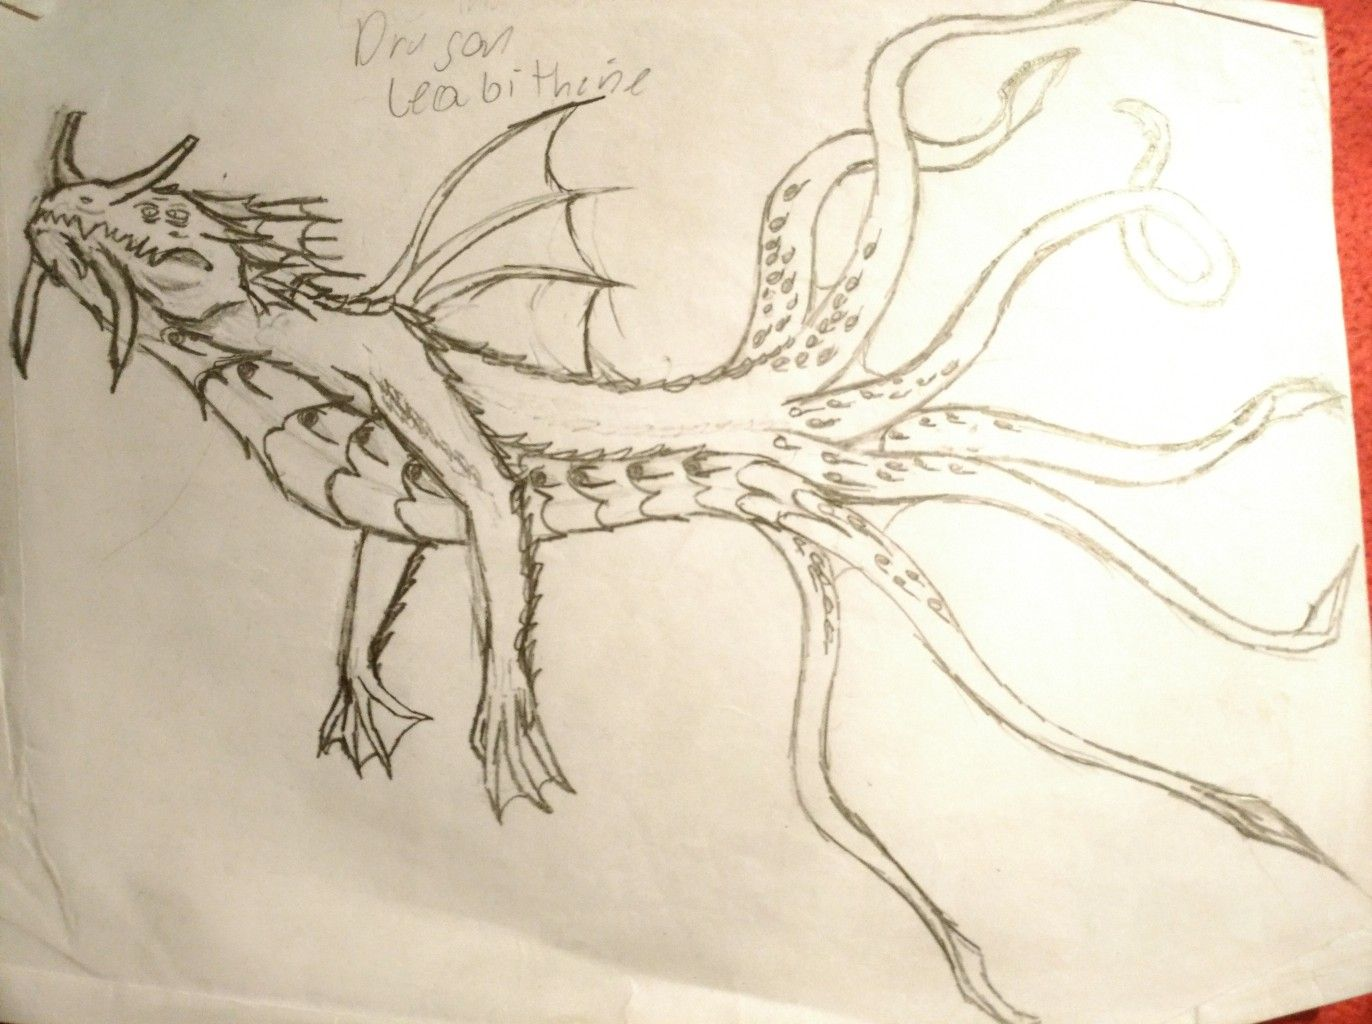 Sea Dragon Leviathan Sea Dragon Leviathan Sea Dragon Art Xenoverse 2 | 14 views | 4 years ago. sea dragon leviathan sea dragon